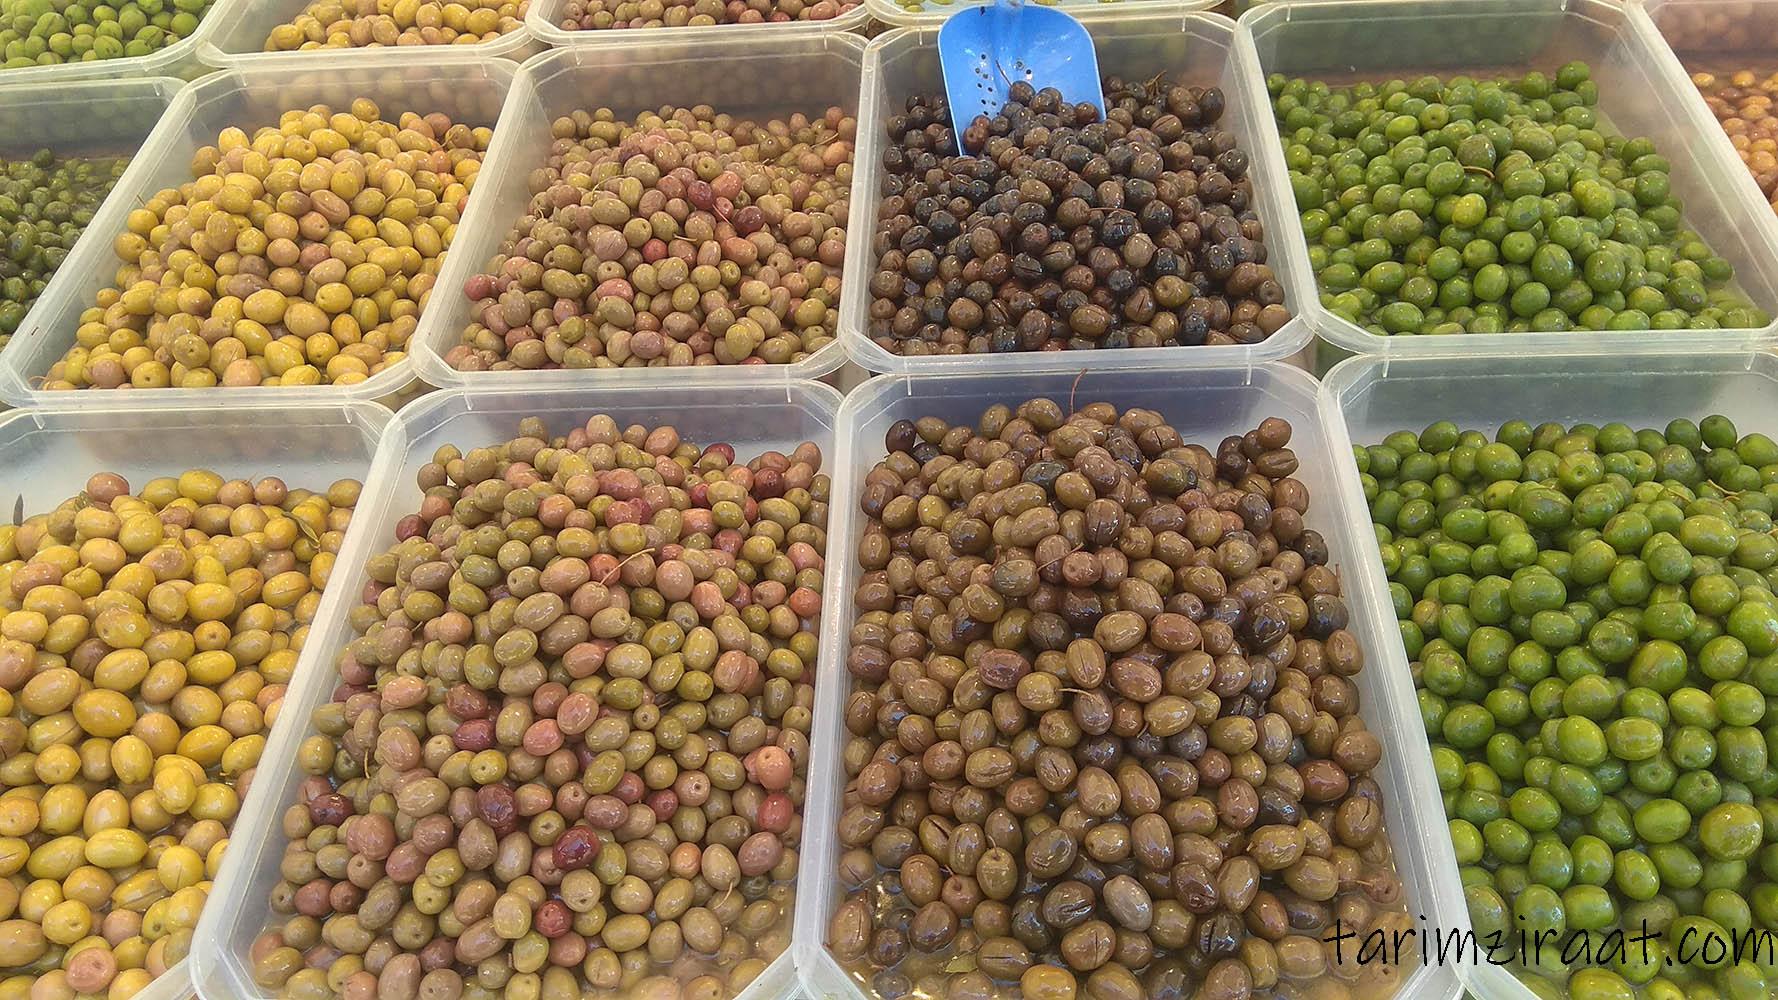 Zeytin fiyatları,Zeytin piyasası, Zeytin resmi